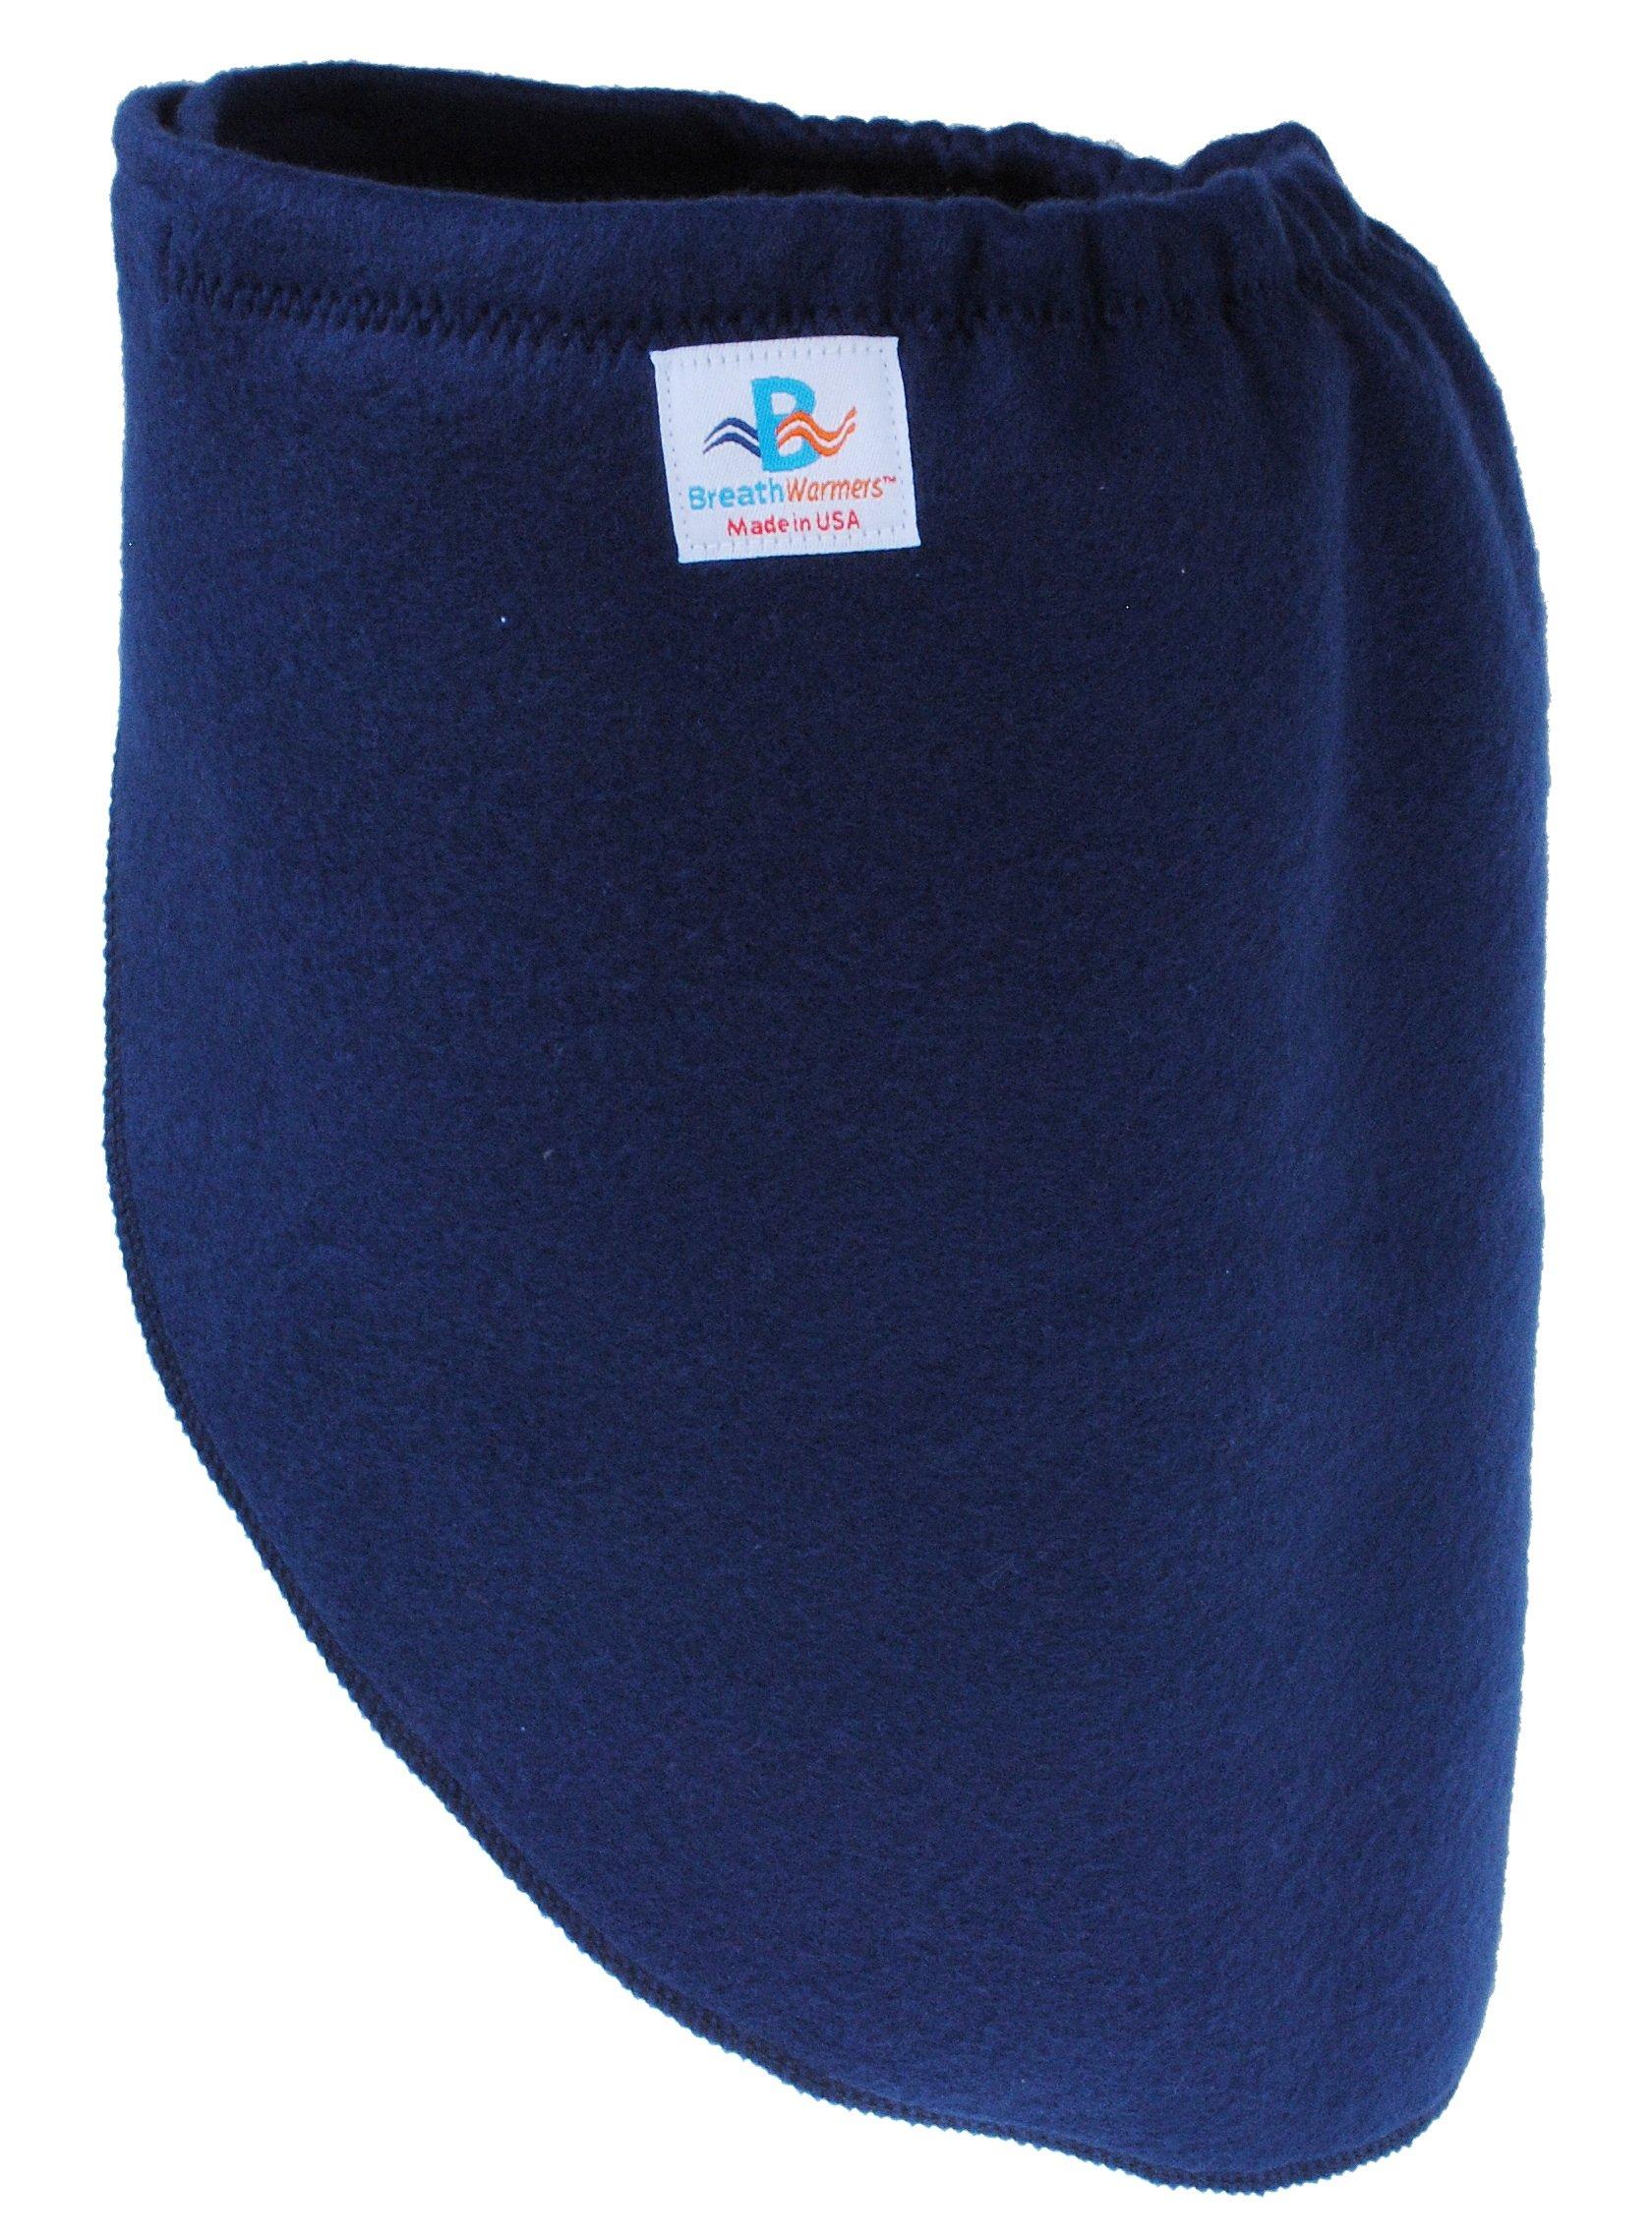 Breathwarmers Cold-Air Warming Scarf (Royal Blue)